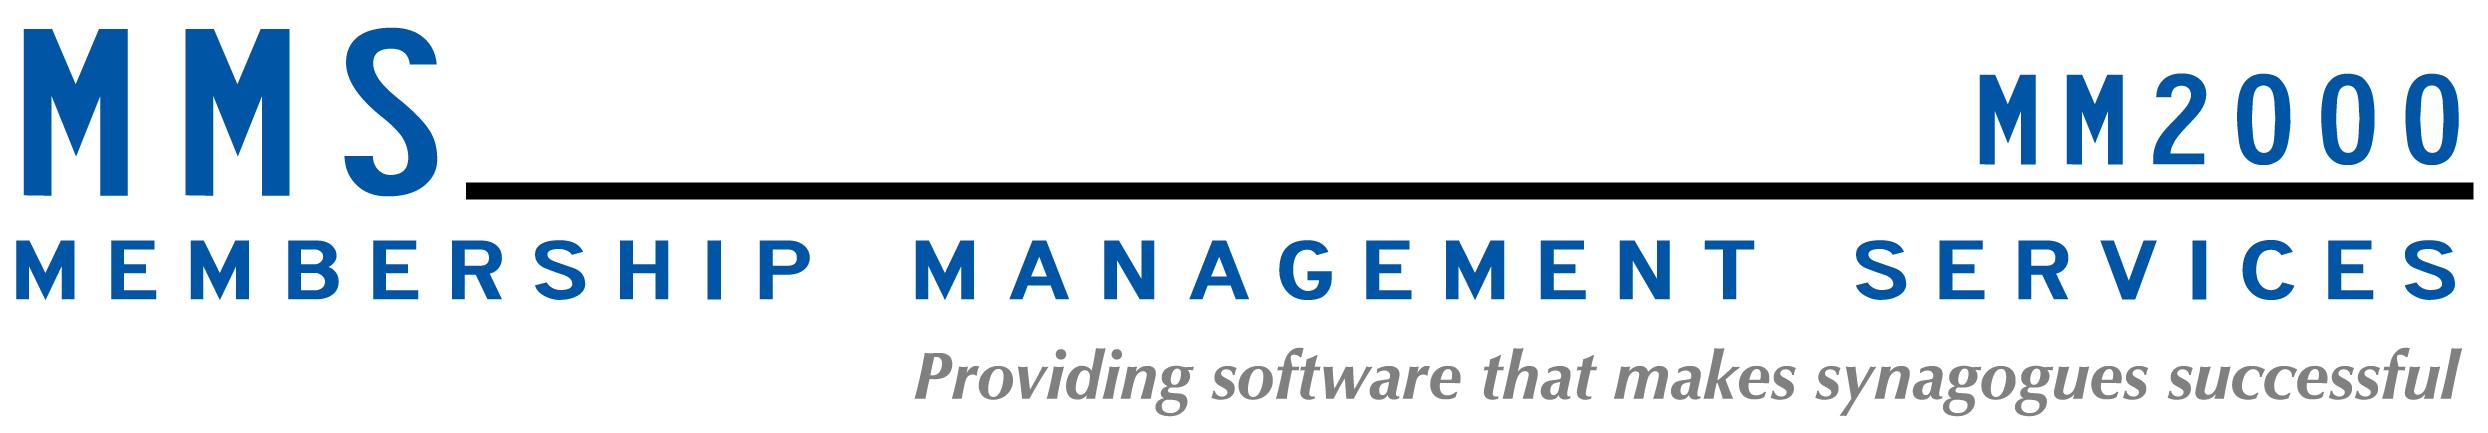 an image of Member Management Service's banner logo